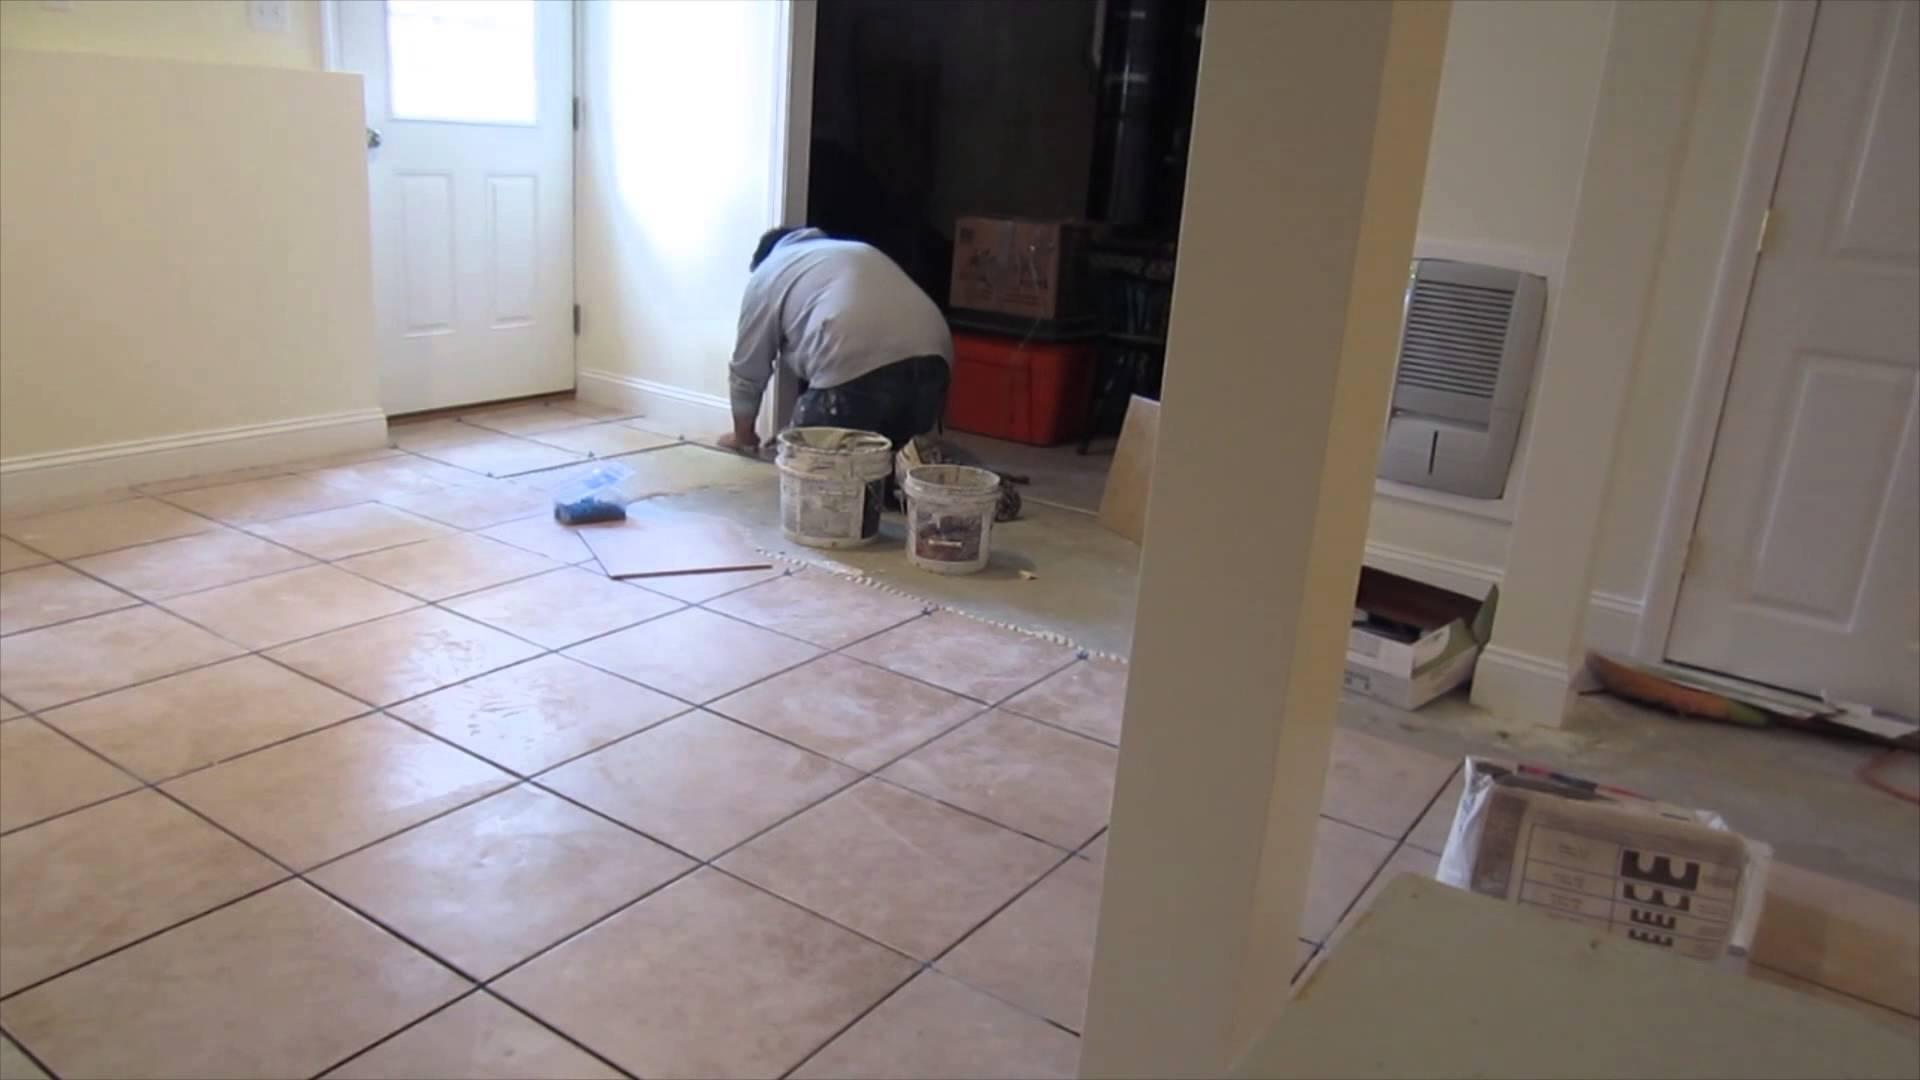 Porcelain Or Ceramic Tile For Basement Floor Porcelain Or Ceramic Tile For Basement Floor time lapse of a 16x16 ceramic tile installation on a basement 1920 X 1080